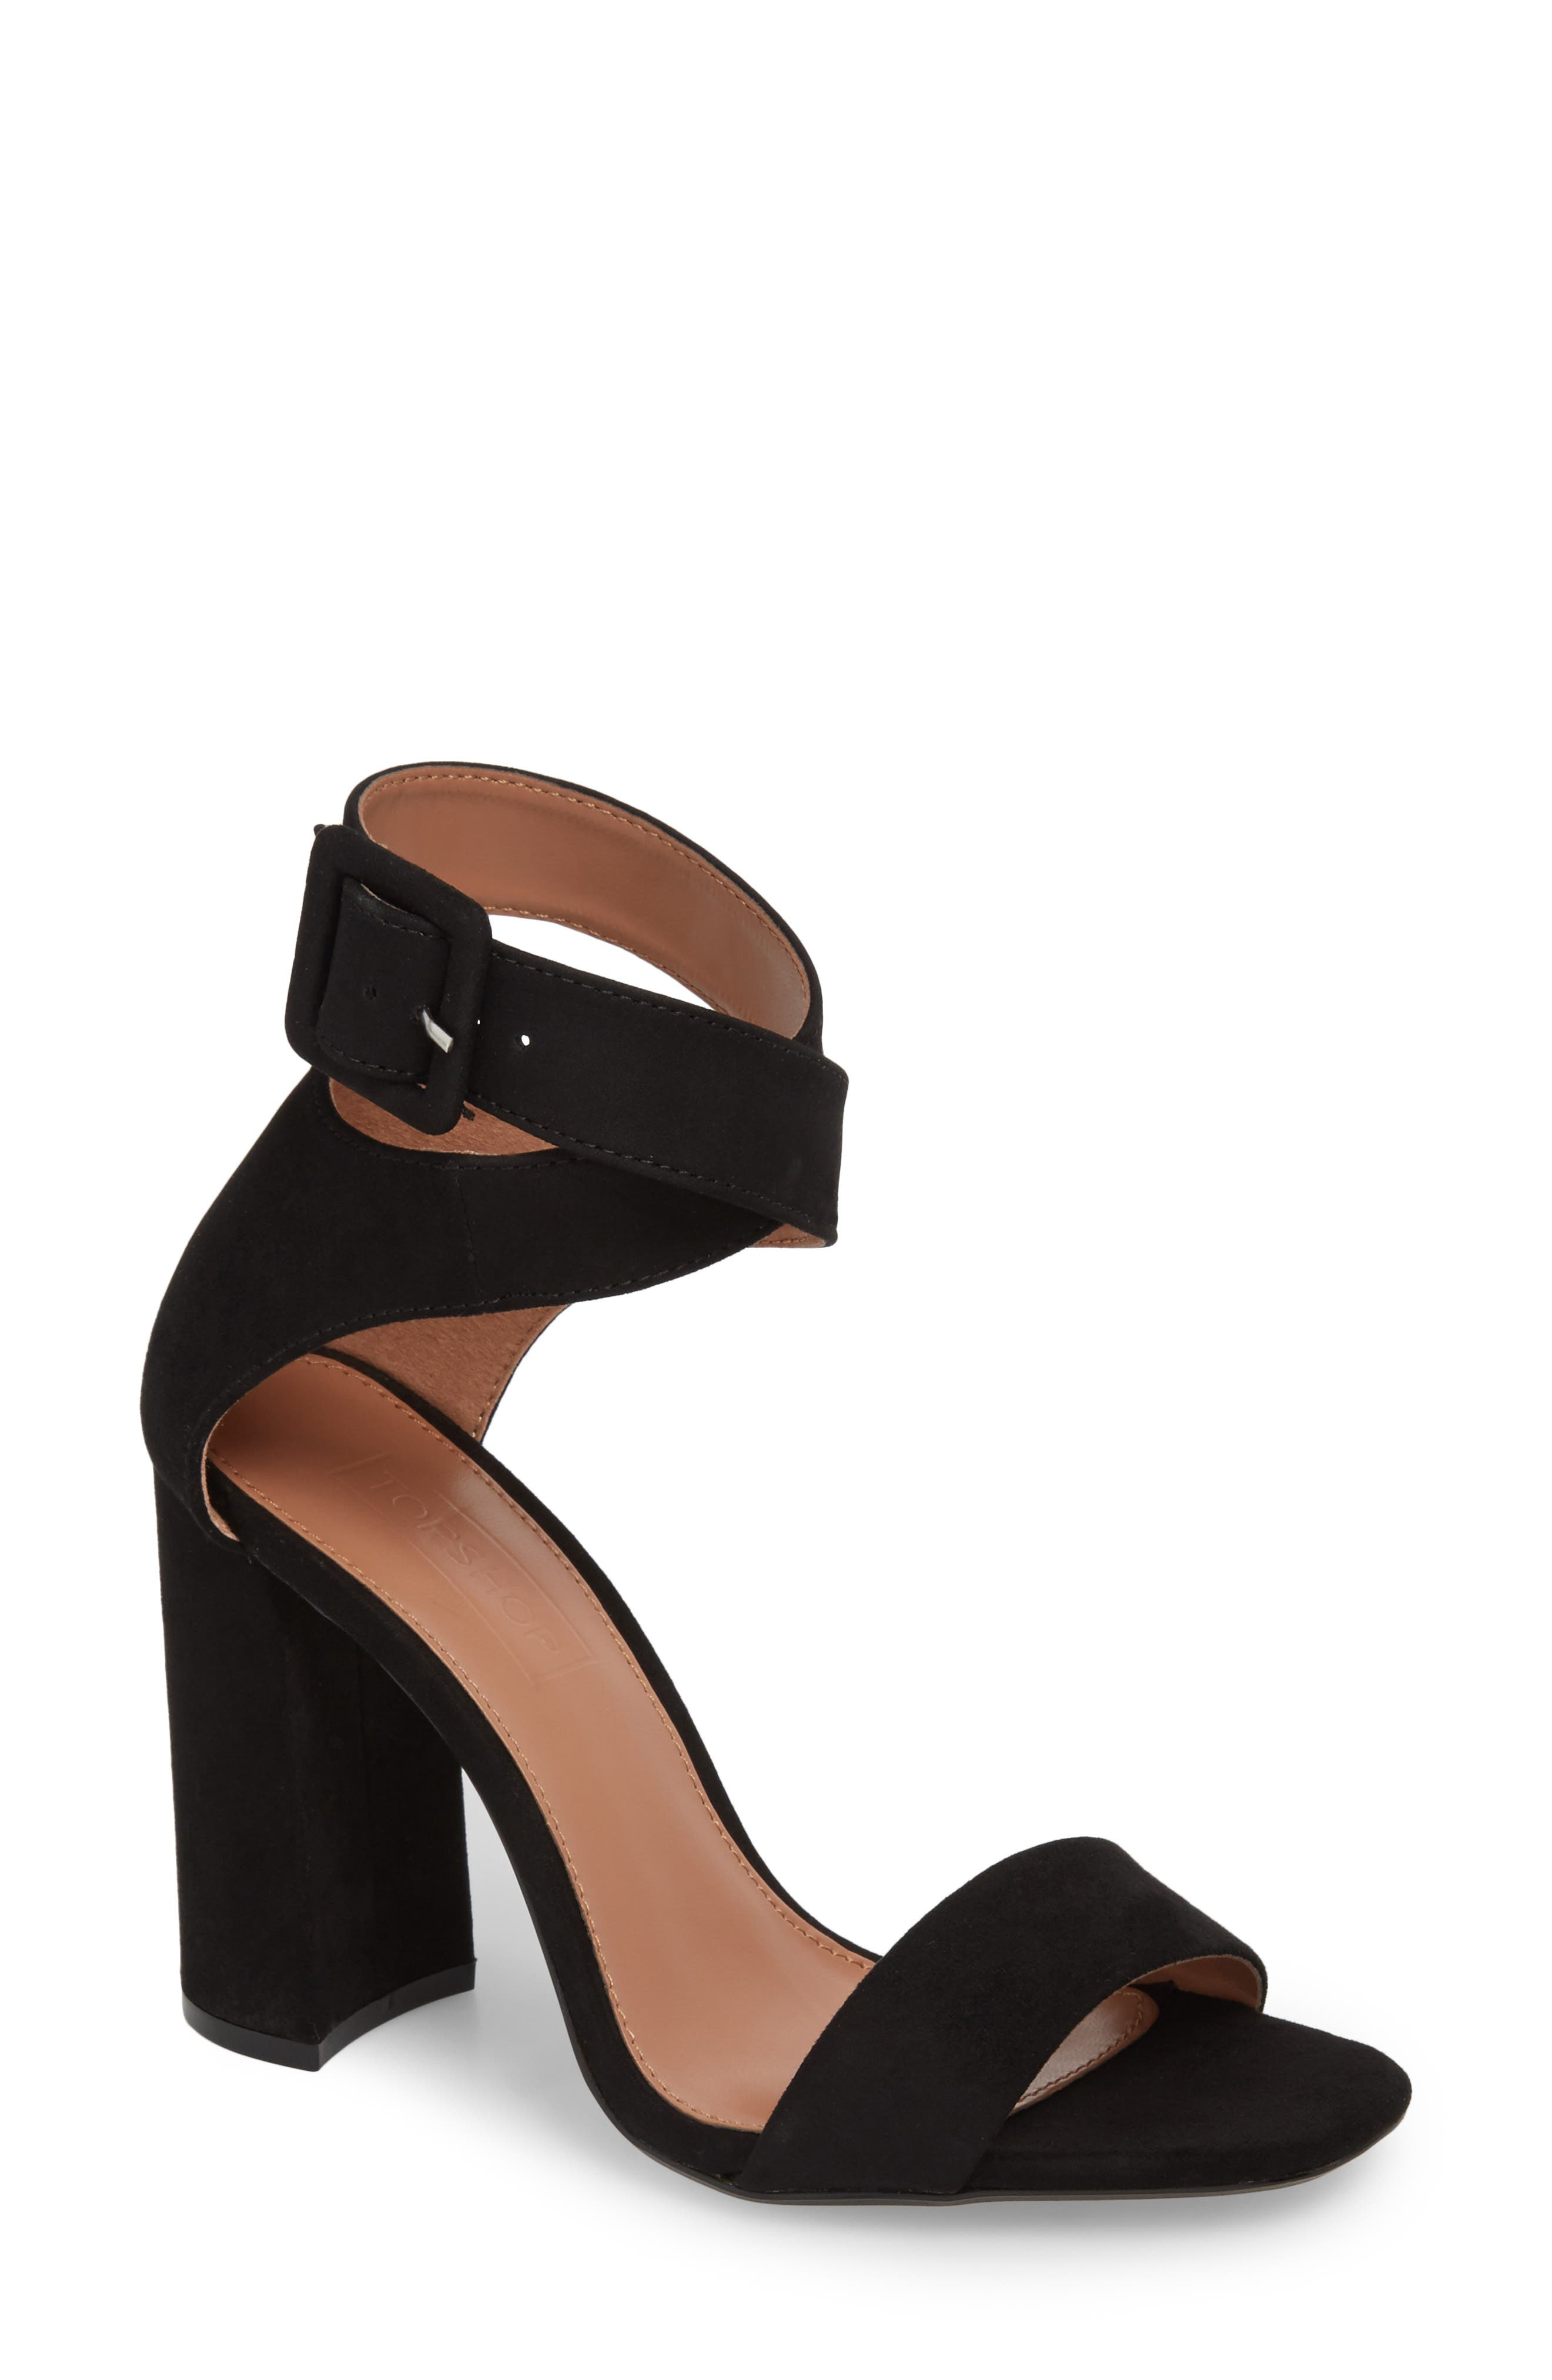 Sinitta Crossover Sandal,                             Main thumbnail 1, color,                             001